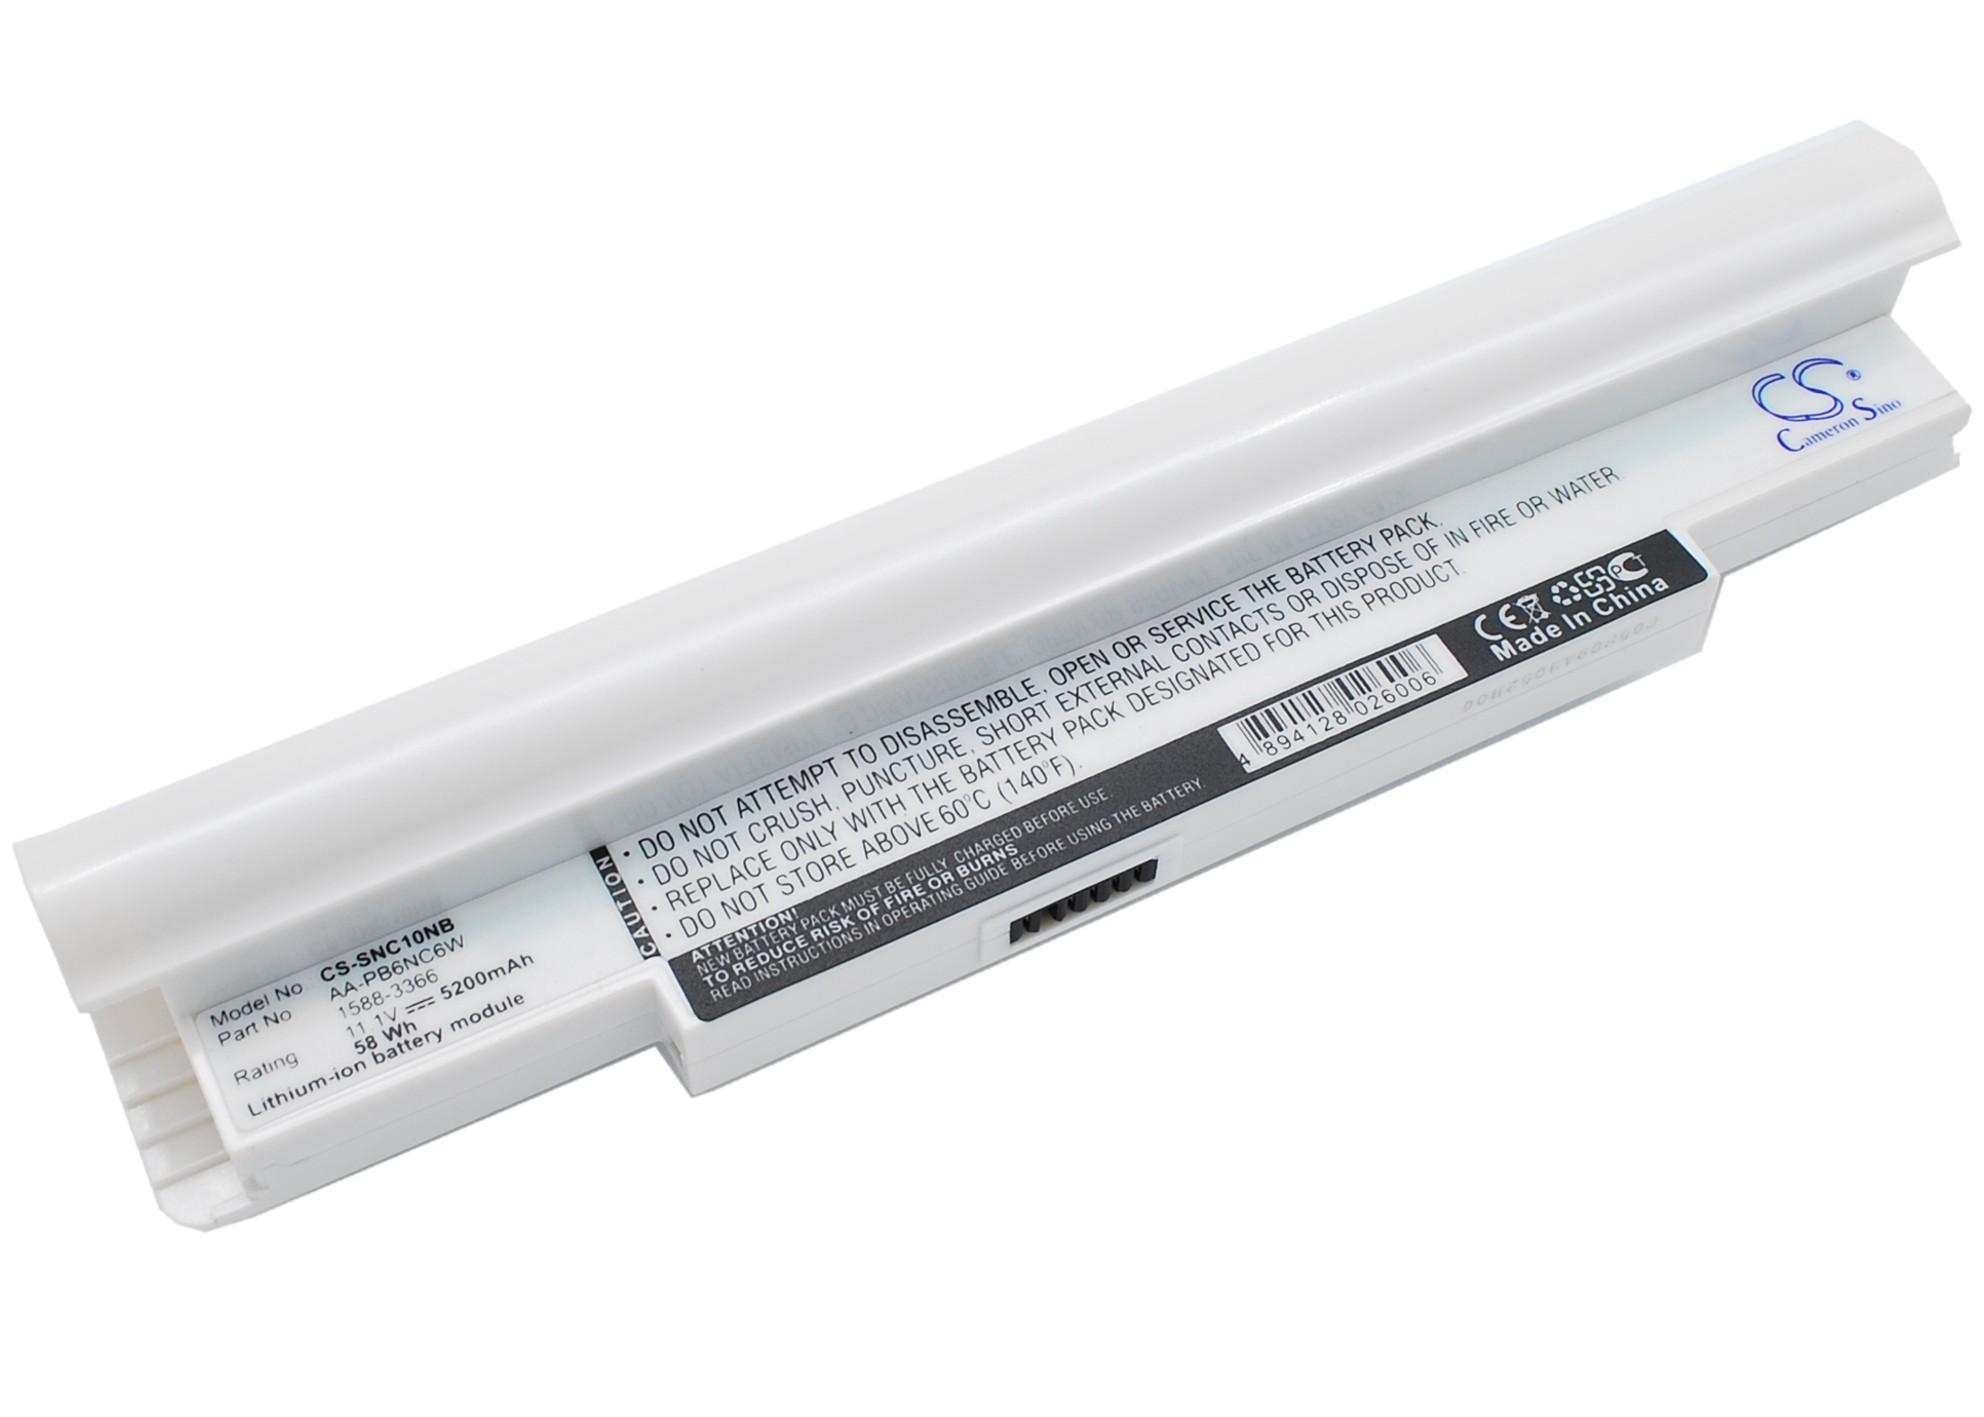 Cameron Sino baterie do notebooků pro SAMSUNG NP-NC20-21GBK 11.1V Li-ion 5200mAh bílá - neoriginální